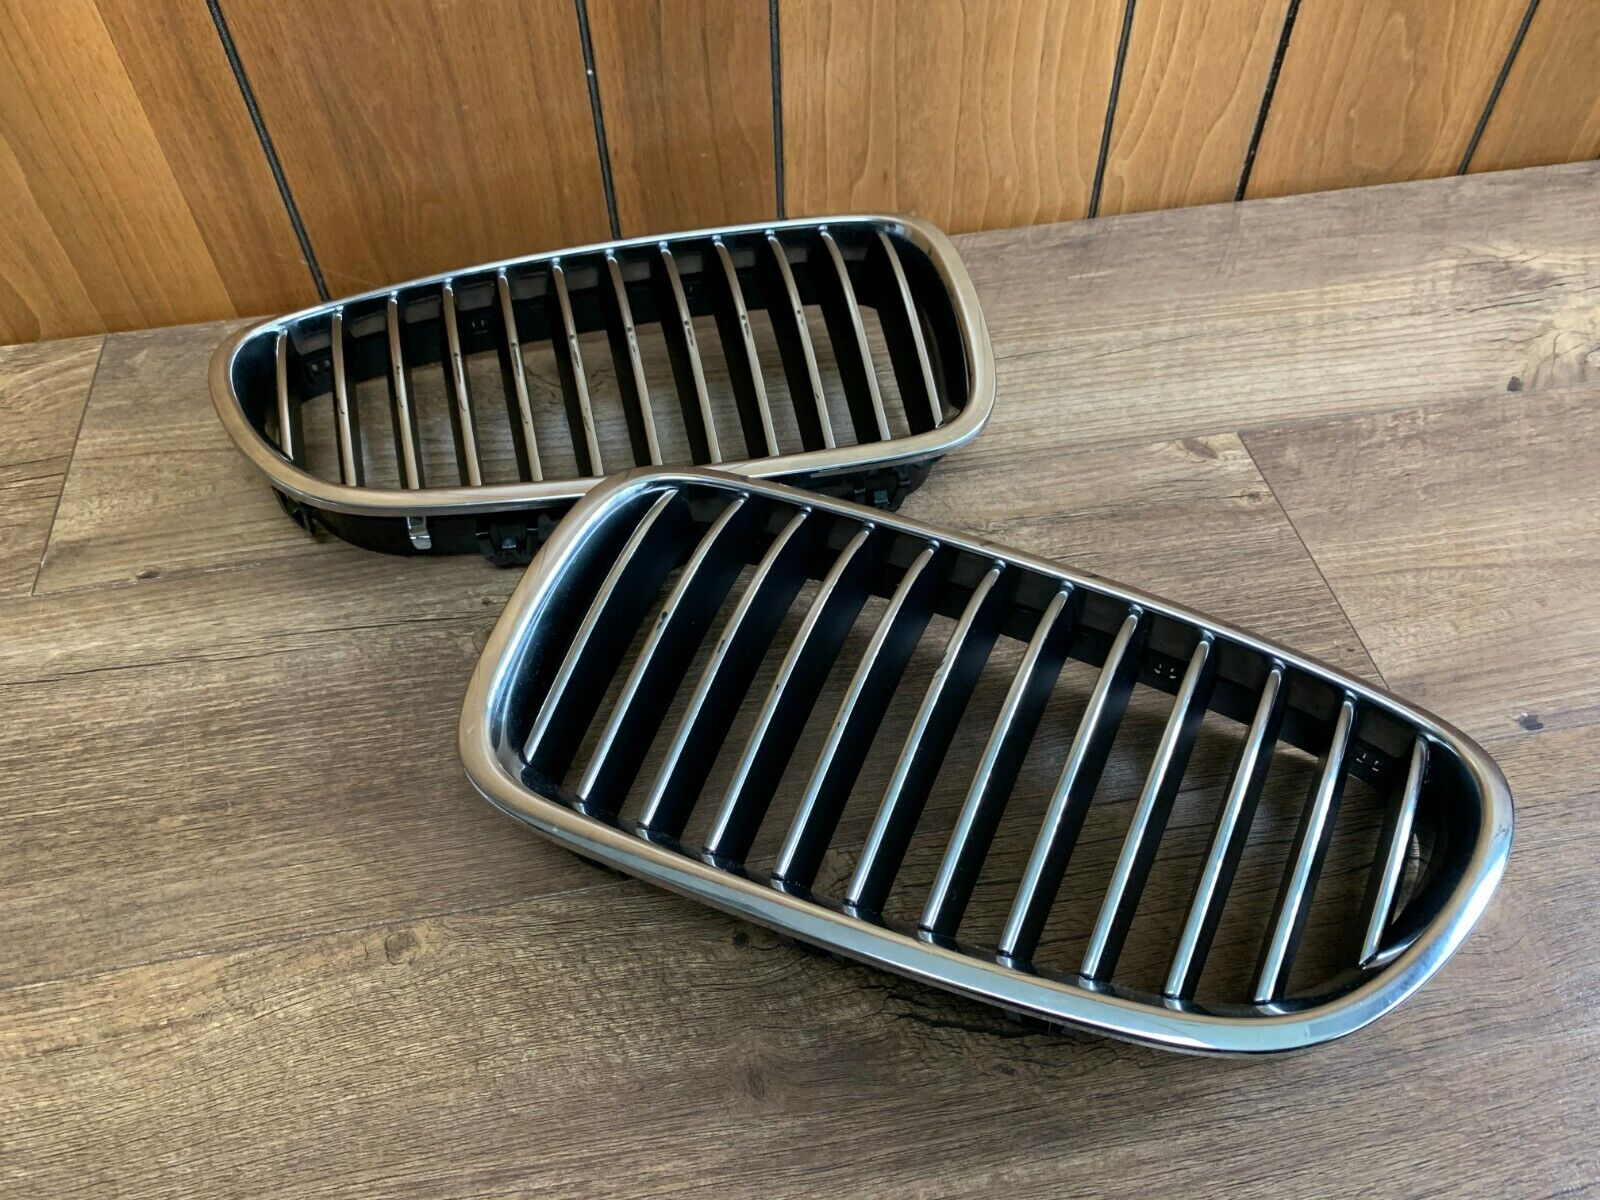 11-13 BMW 528 535 550 Front Bumper Radiator Kidney Grille Left & Right Side F10